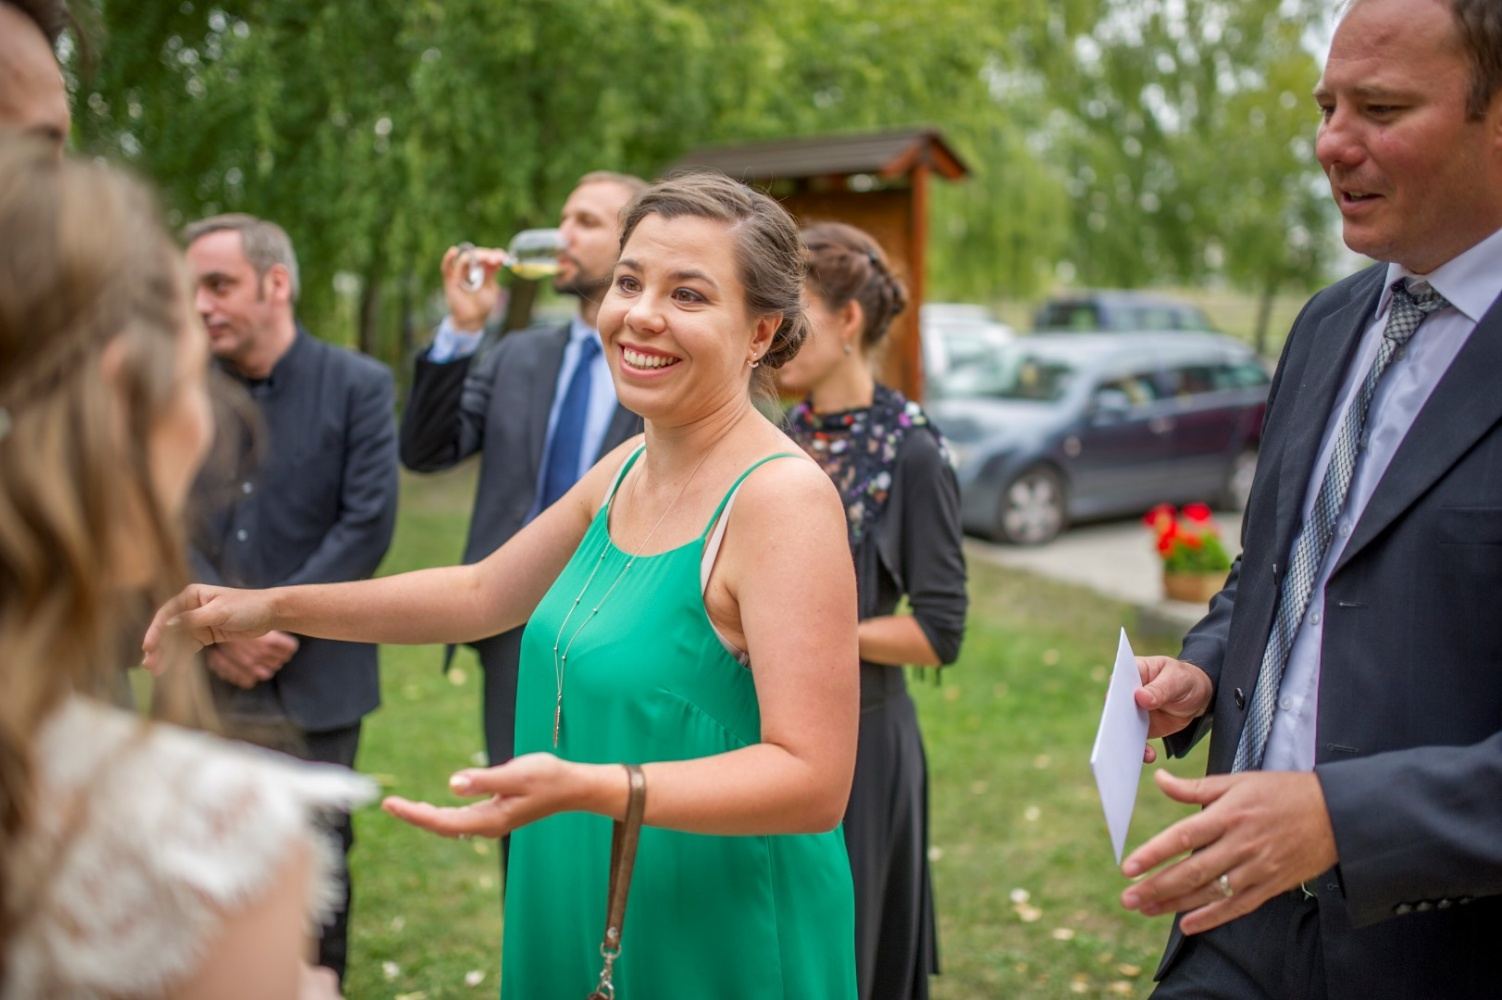 http://www.fotoz.sk/images/gallery-36/normal/svadobny-fotograf_eskuvoi-fotos_lacny-fotograf_fotograf-na-svadbu_plauter-kuria_fotograf-nitra_fotograf-galanta_juraj-zsok243.jpg